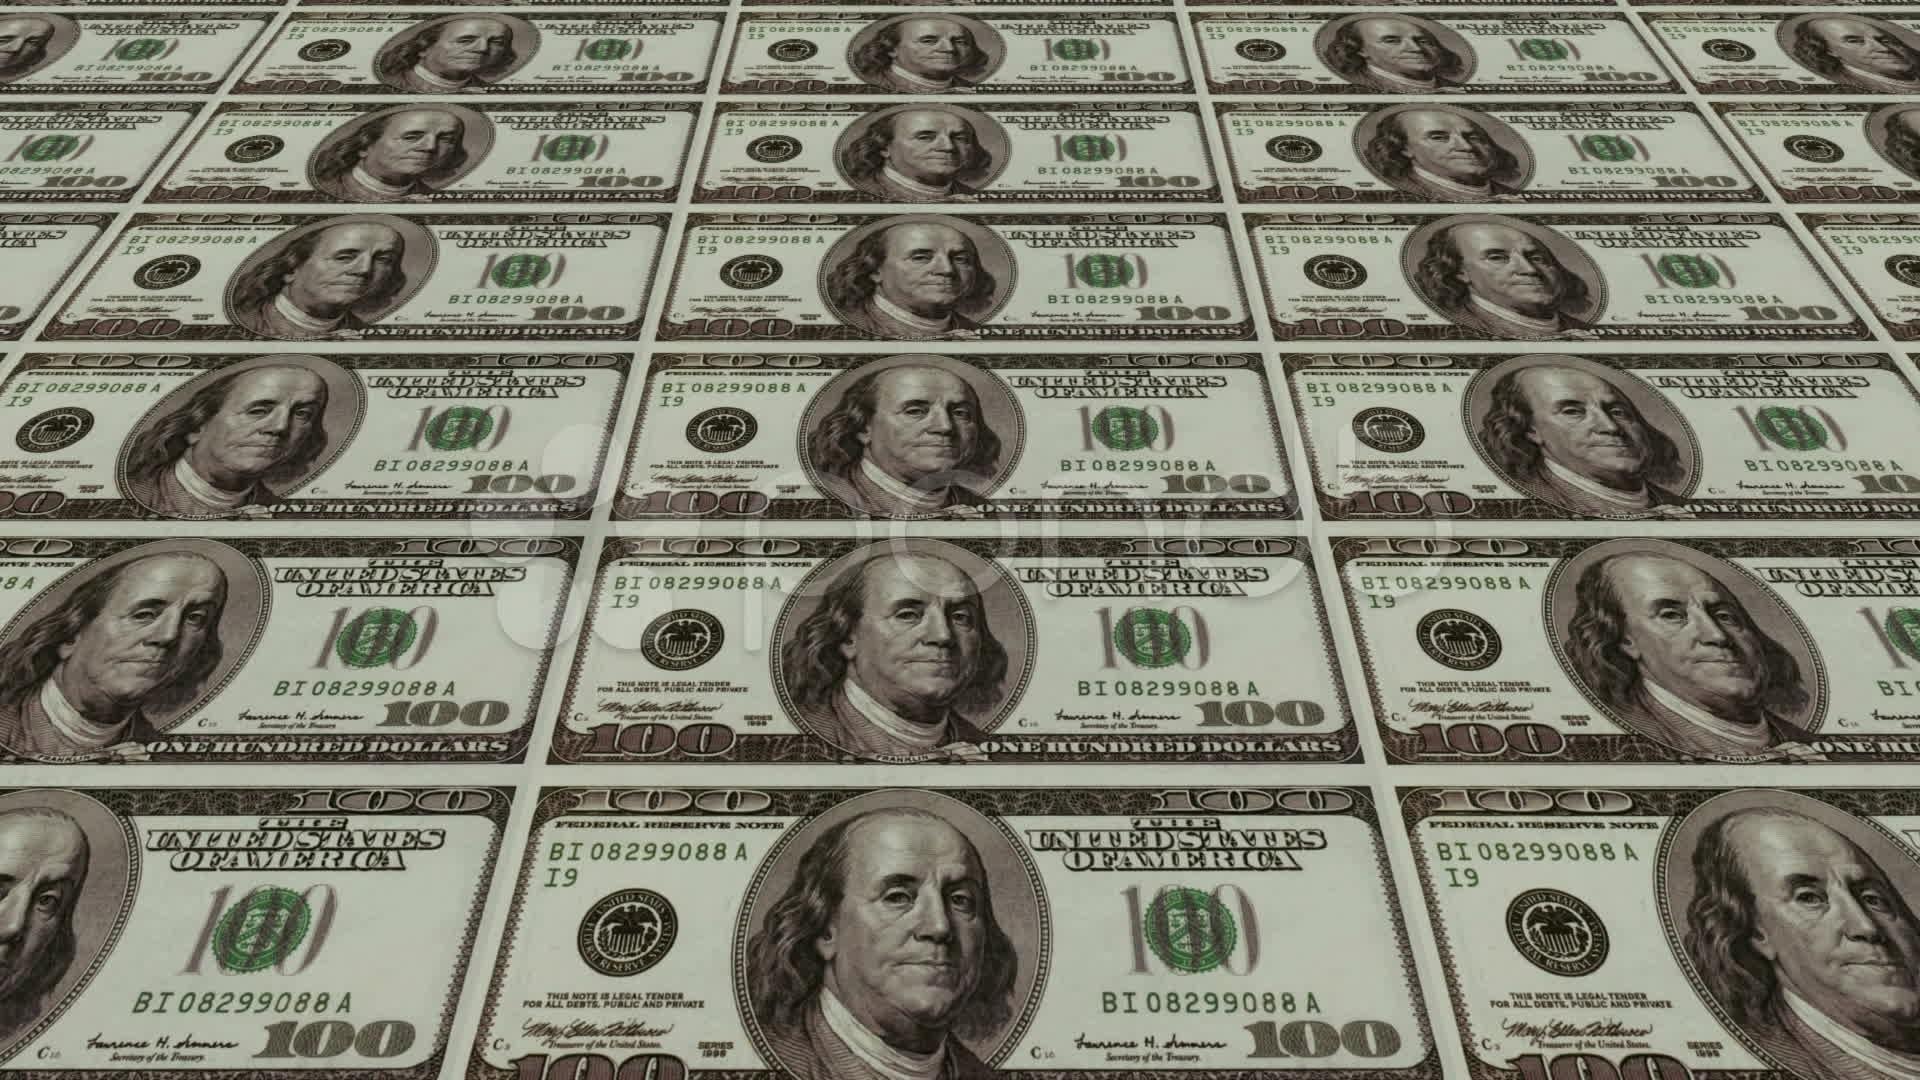 100 dollar bill wallpapers - wallpaper cave